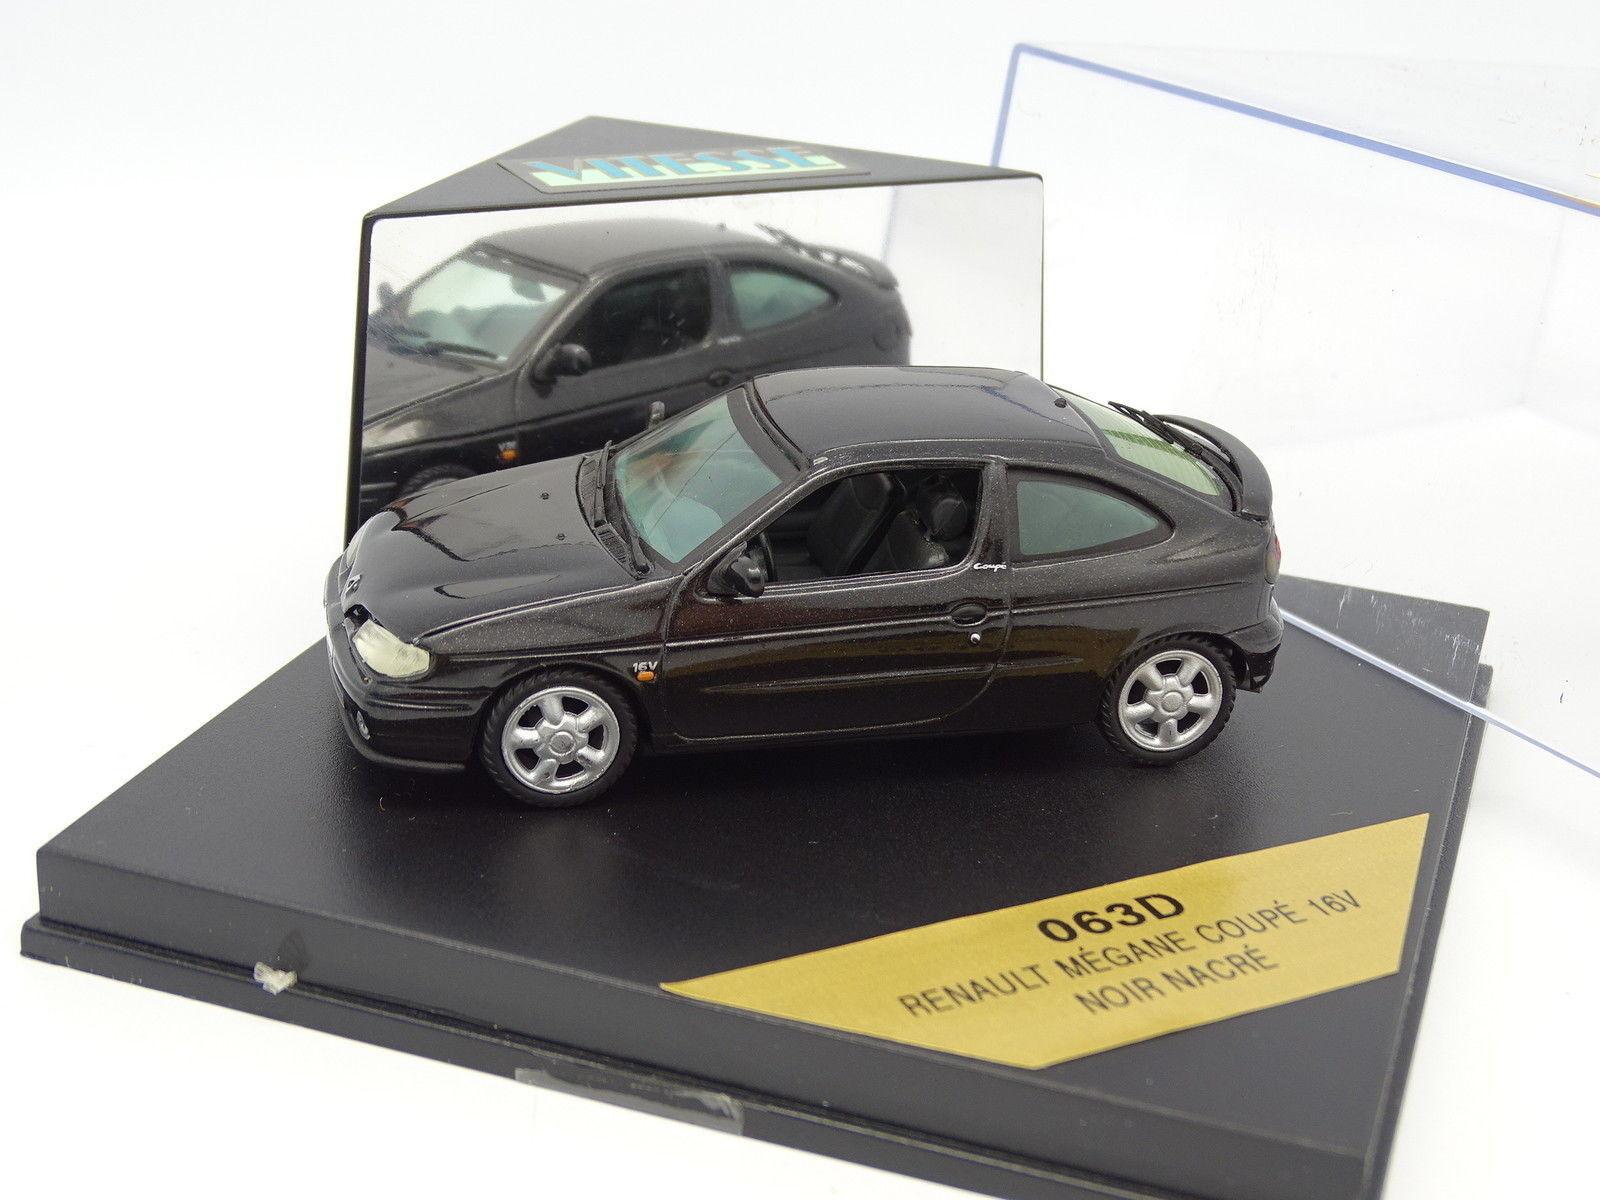 Vitesse 1 43 - Renault Megane coupé 16V 16V 16V schwarz fb5158